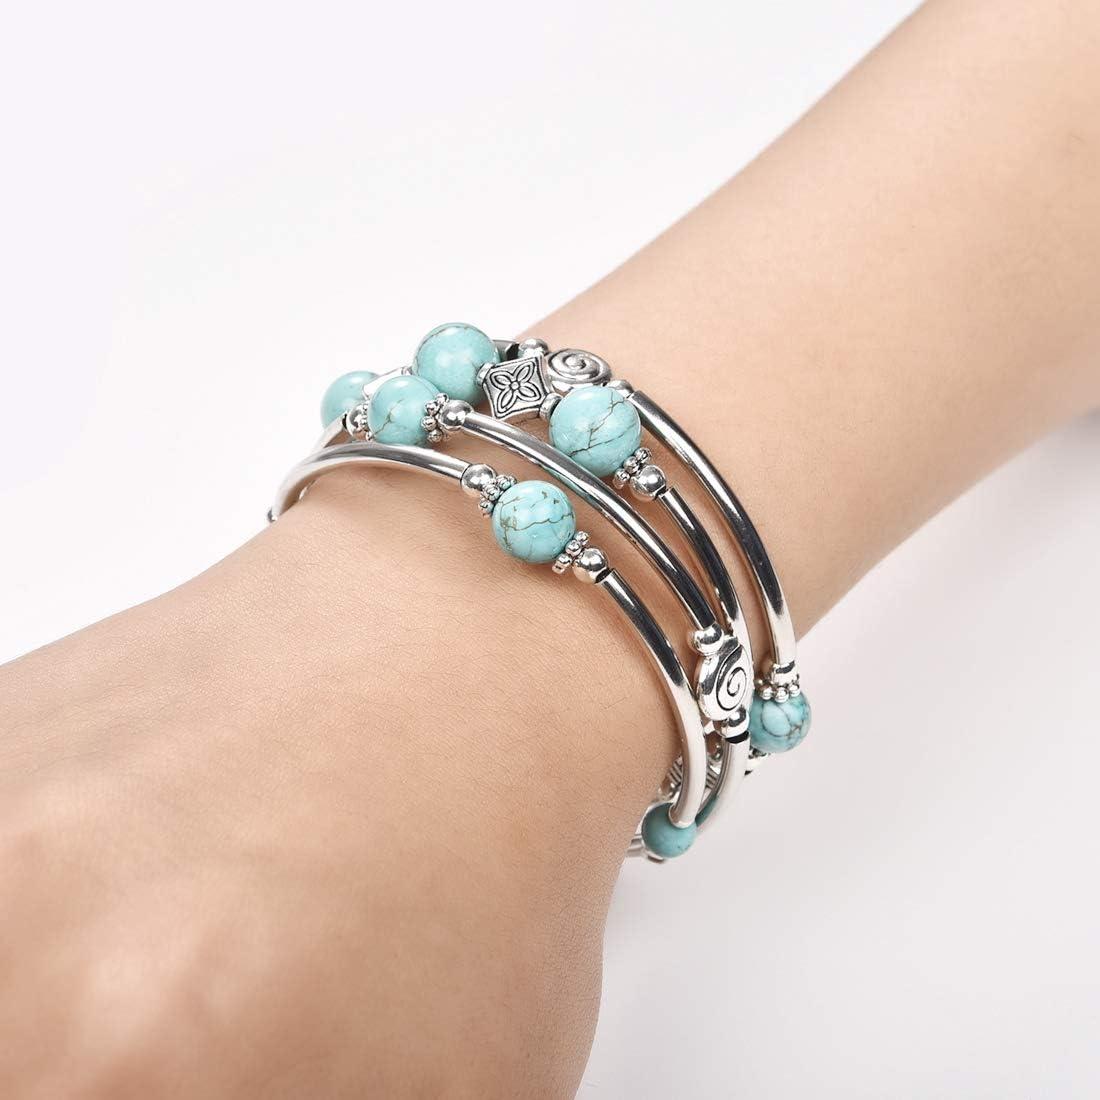 DALARAN Beaded Chakra Bangle Turquoise Bracelet Wrap Bracelet with Thick Silver Metal and Mala Beads